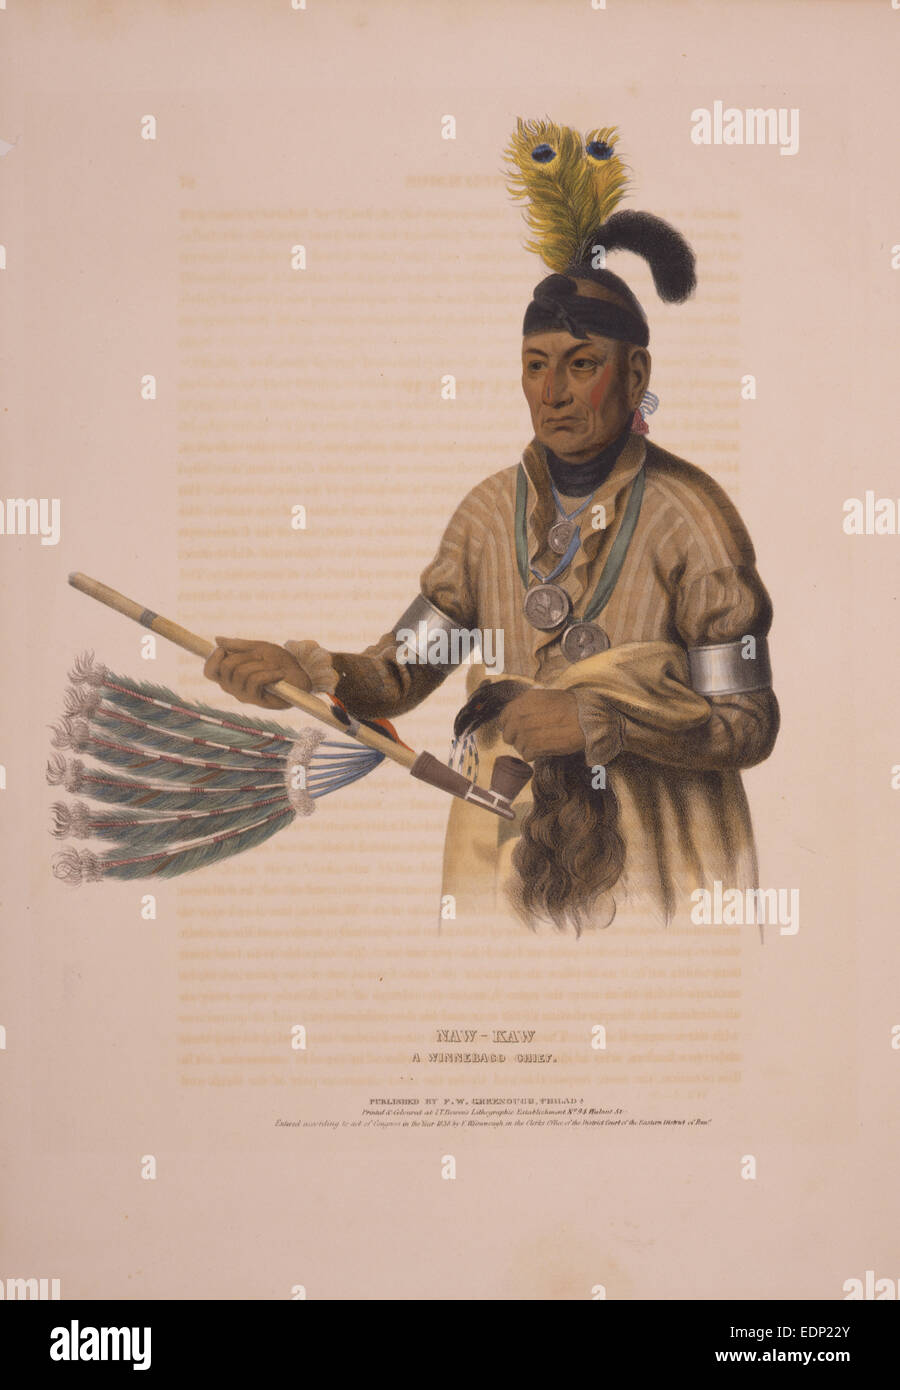 Naw-kaw, a Winnebago chief / drawn, printed & coloured at I.T. Bowen's Lithographic Establishment, no. 94 - Stock Image